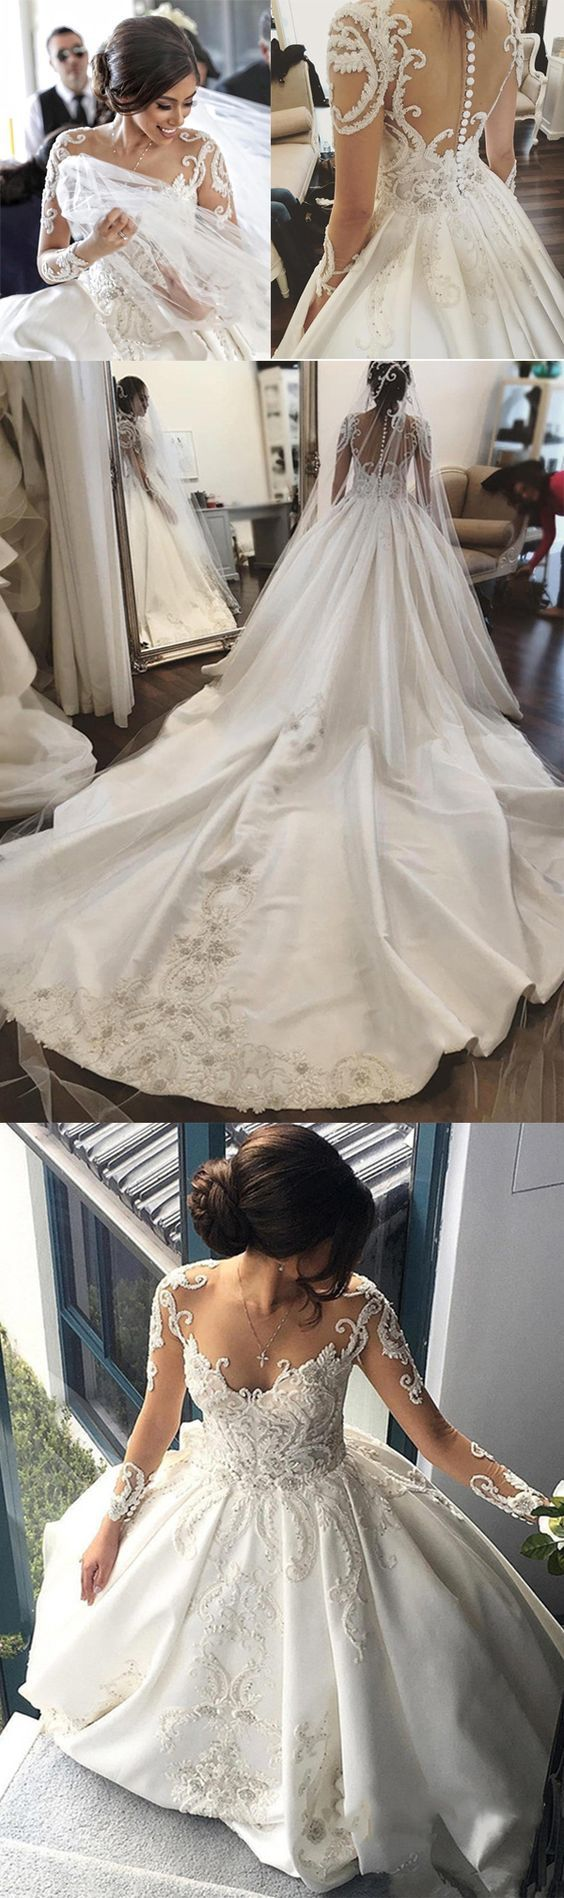 Material:Matte Satin Embellishments:Appliques,Beading  #wedding #bridal #weddingdress #bridesmaid